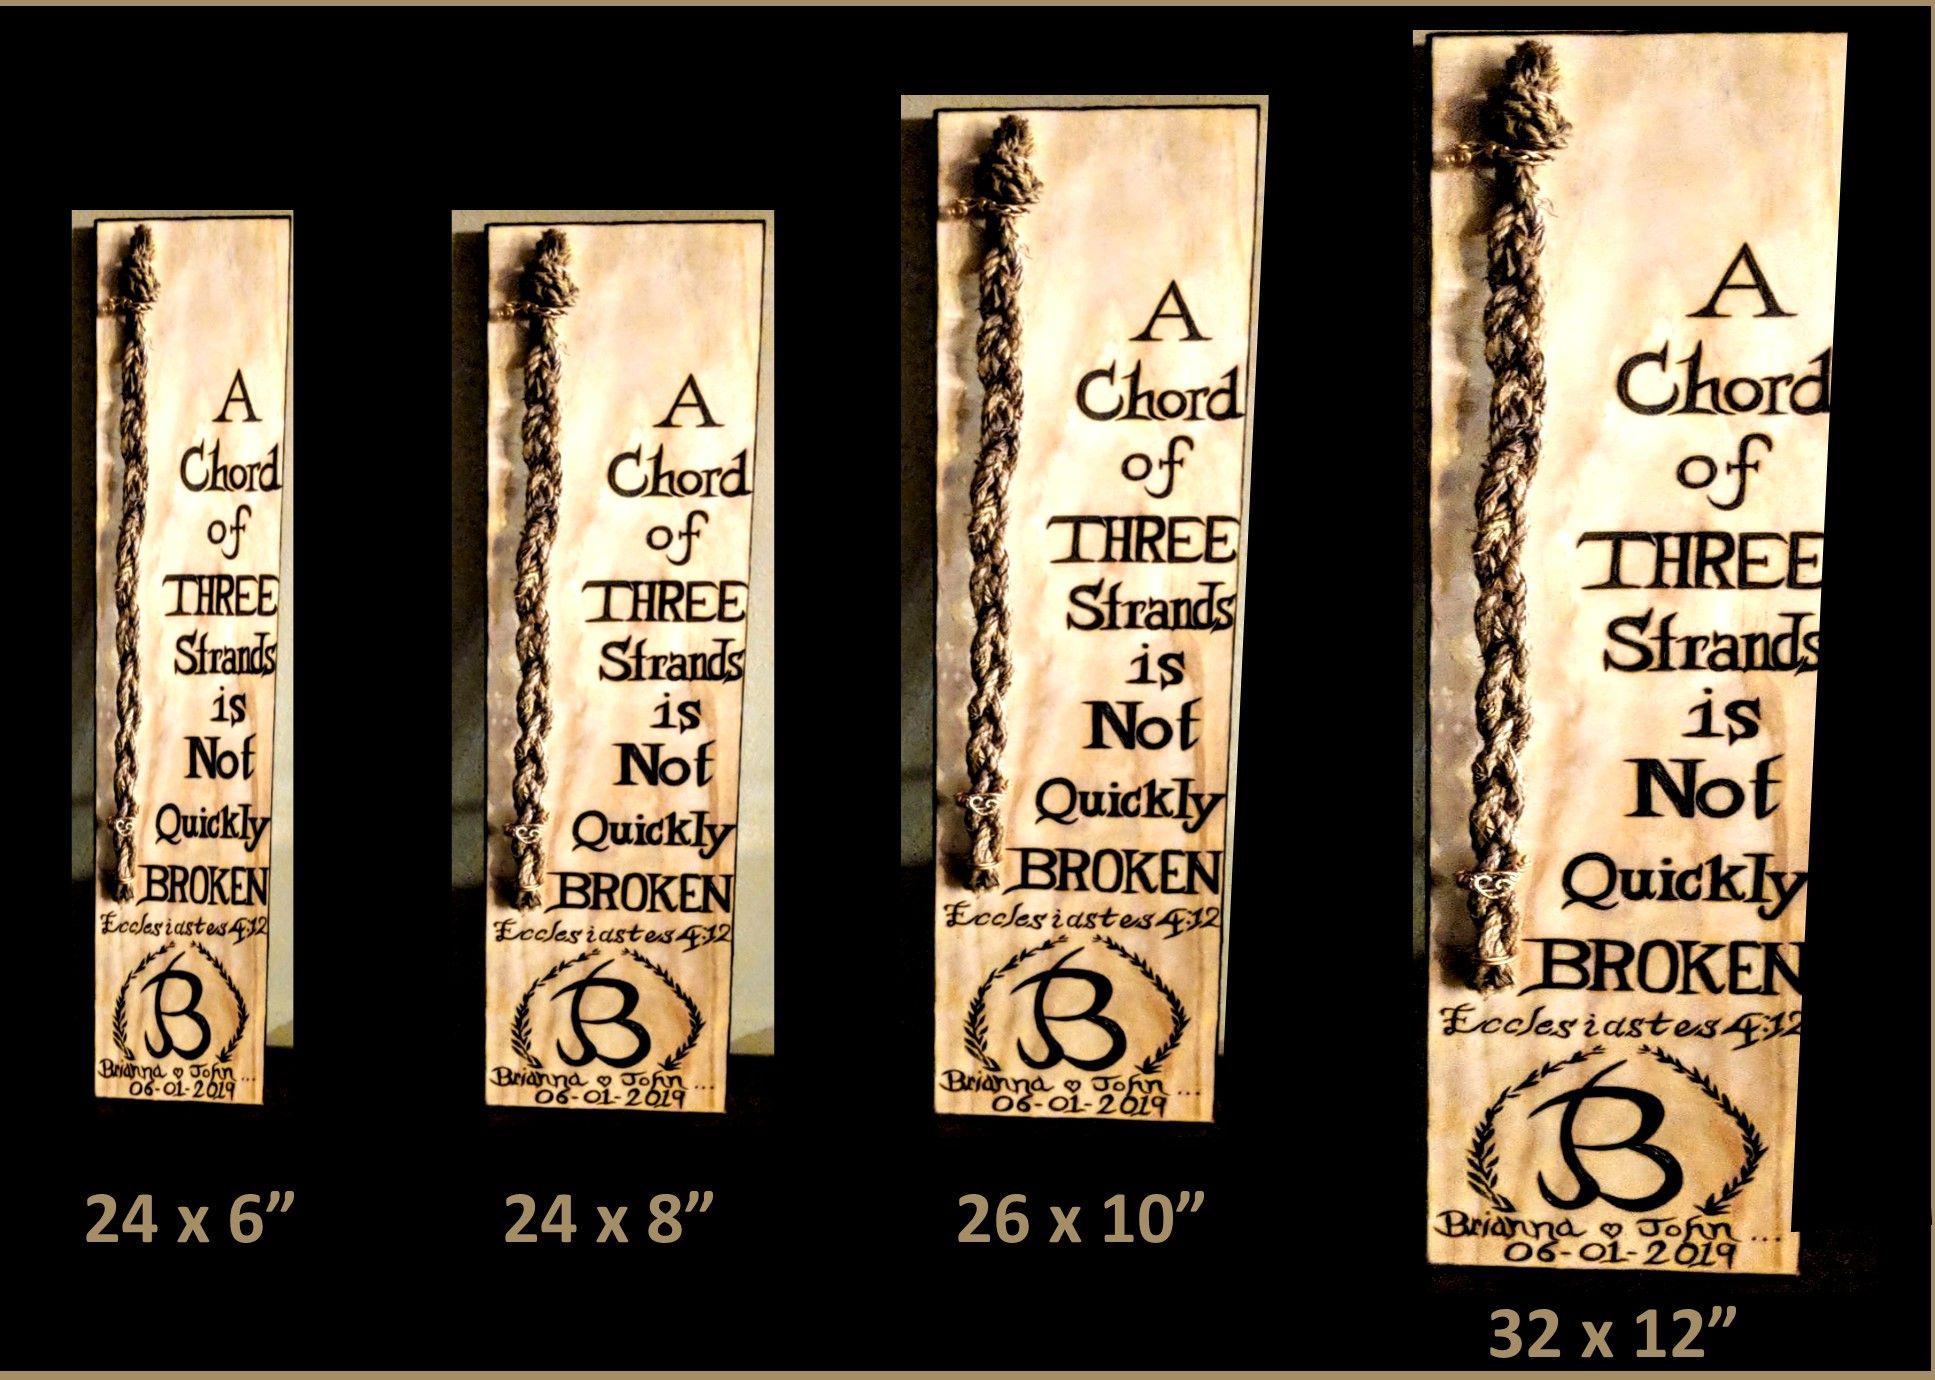 Wedding Braid Sign Cord Of Three Strands Ceremony Braid Sign Personalized Ceremony Braid